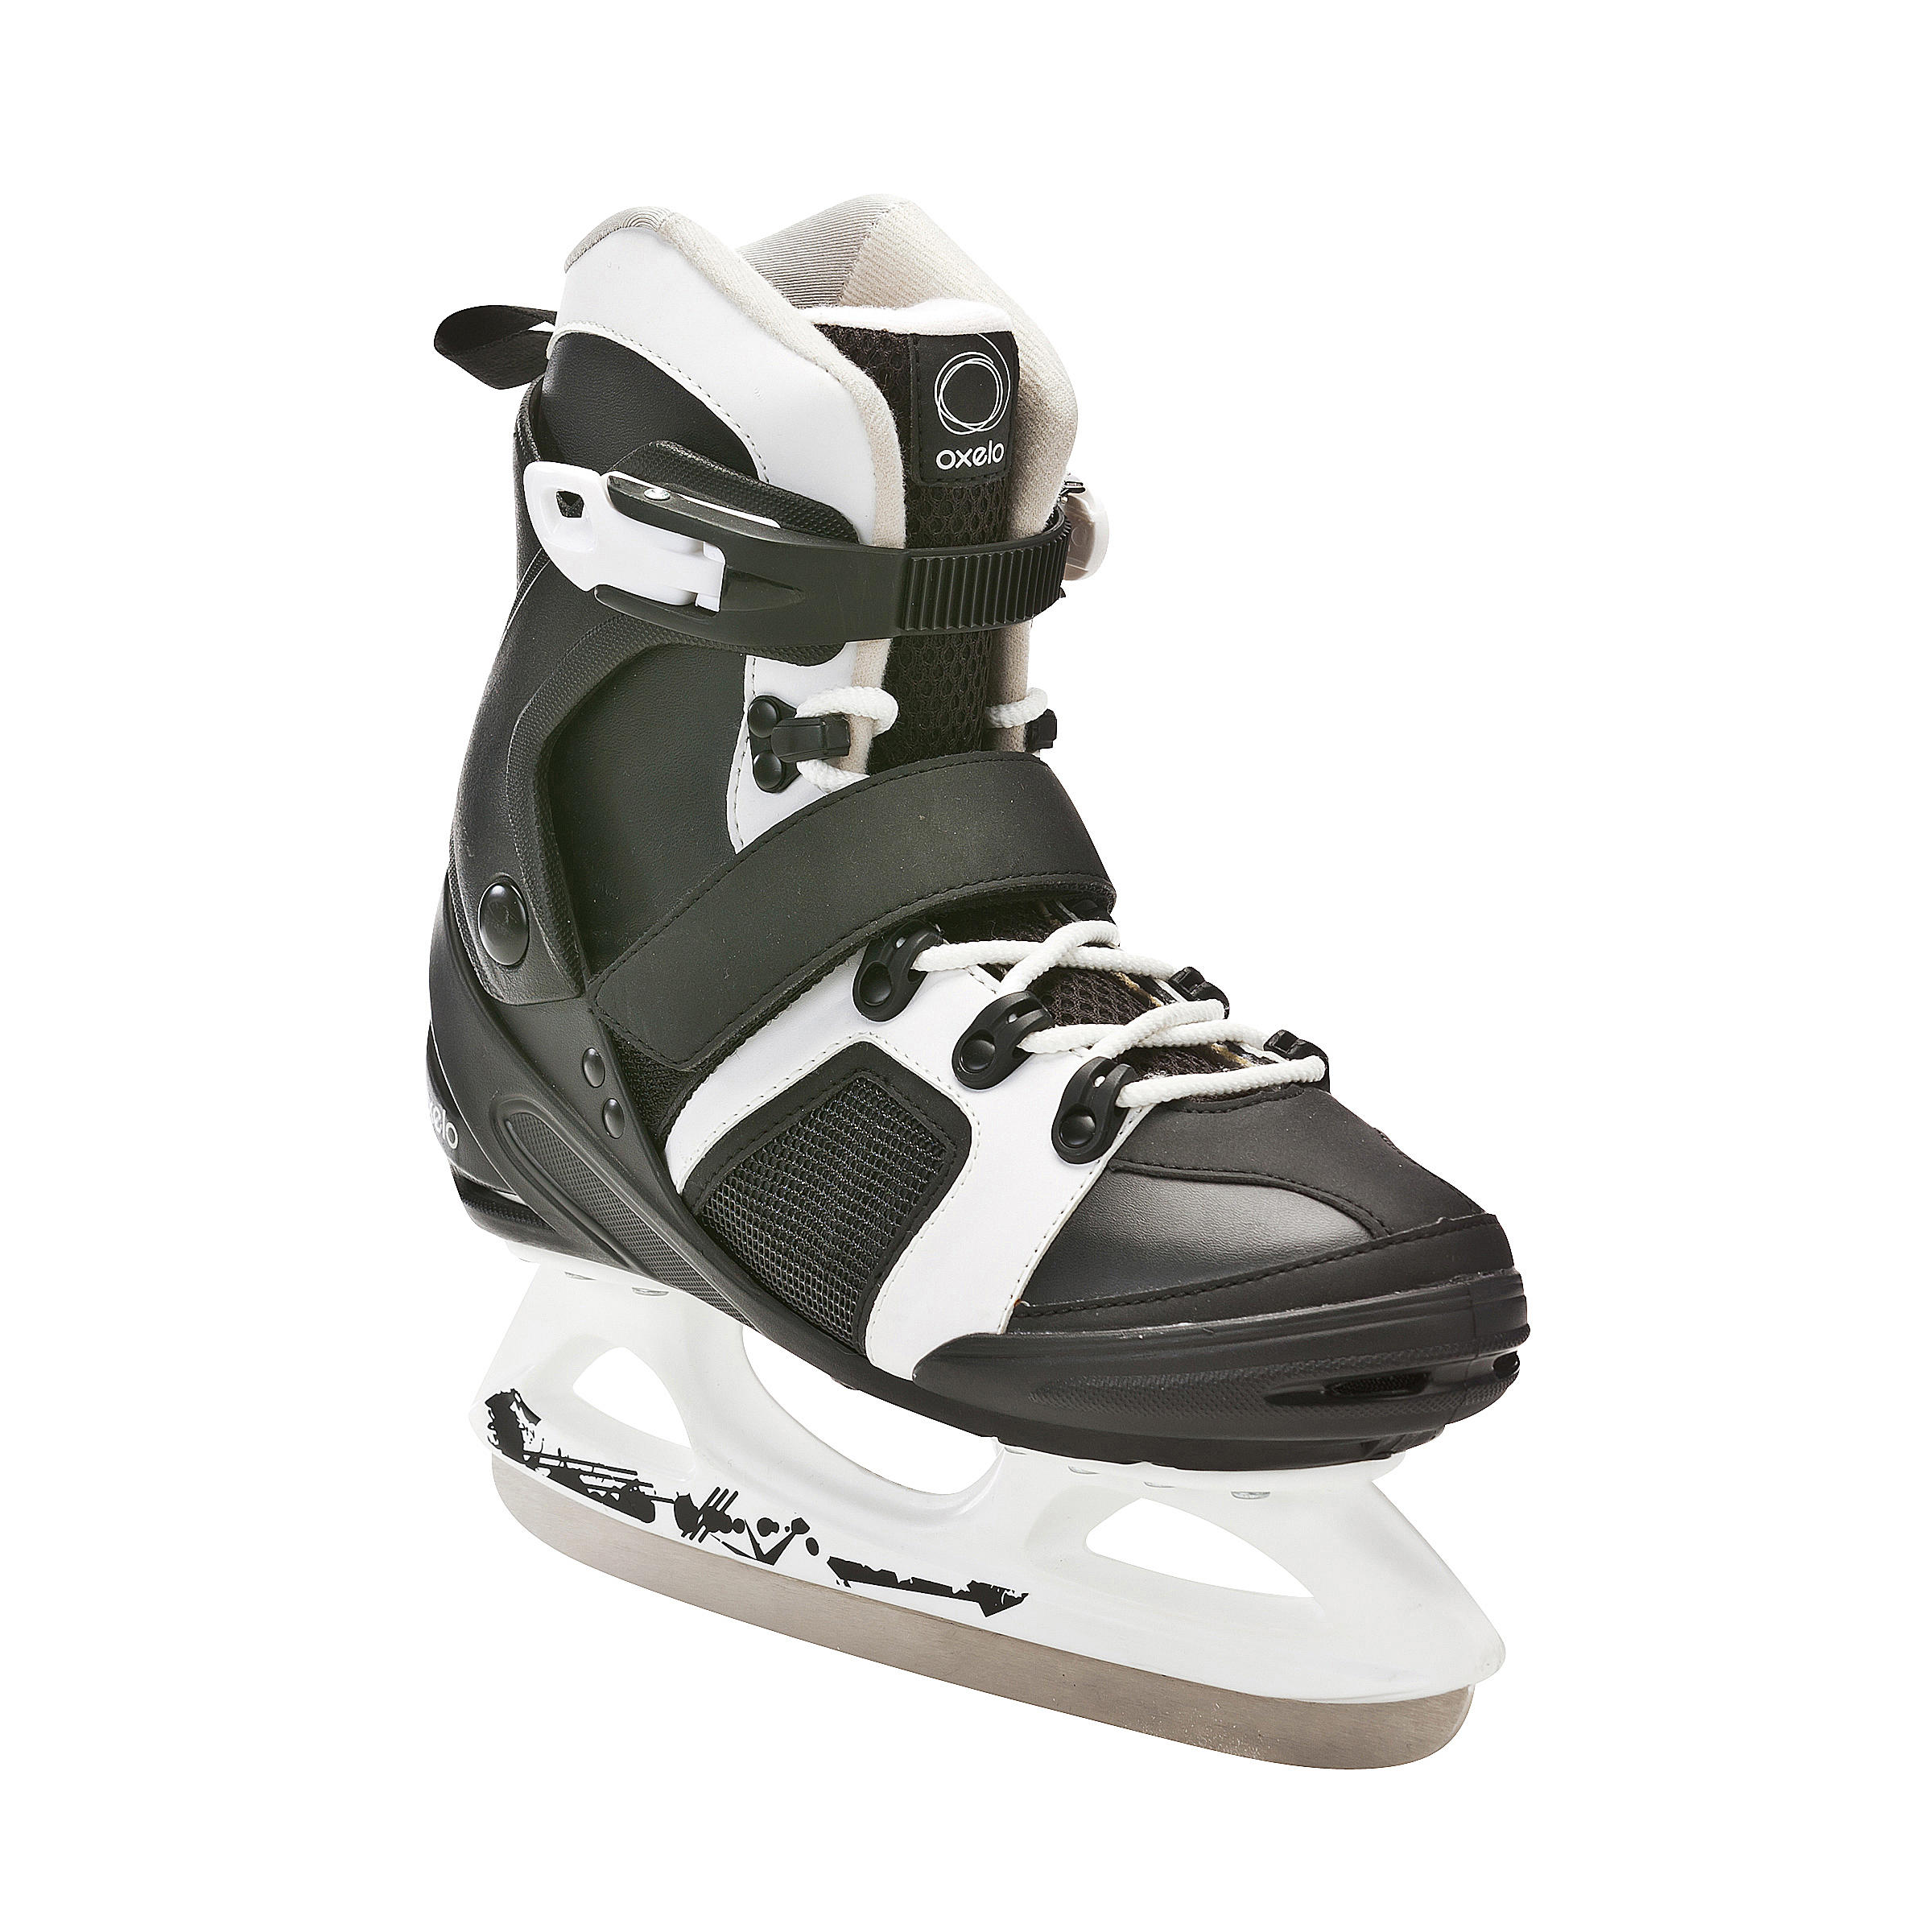 Fit 3 Ice Skates - Black/White